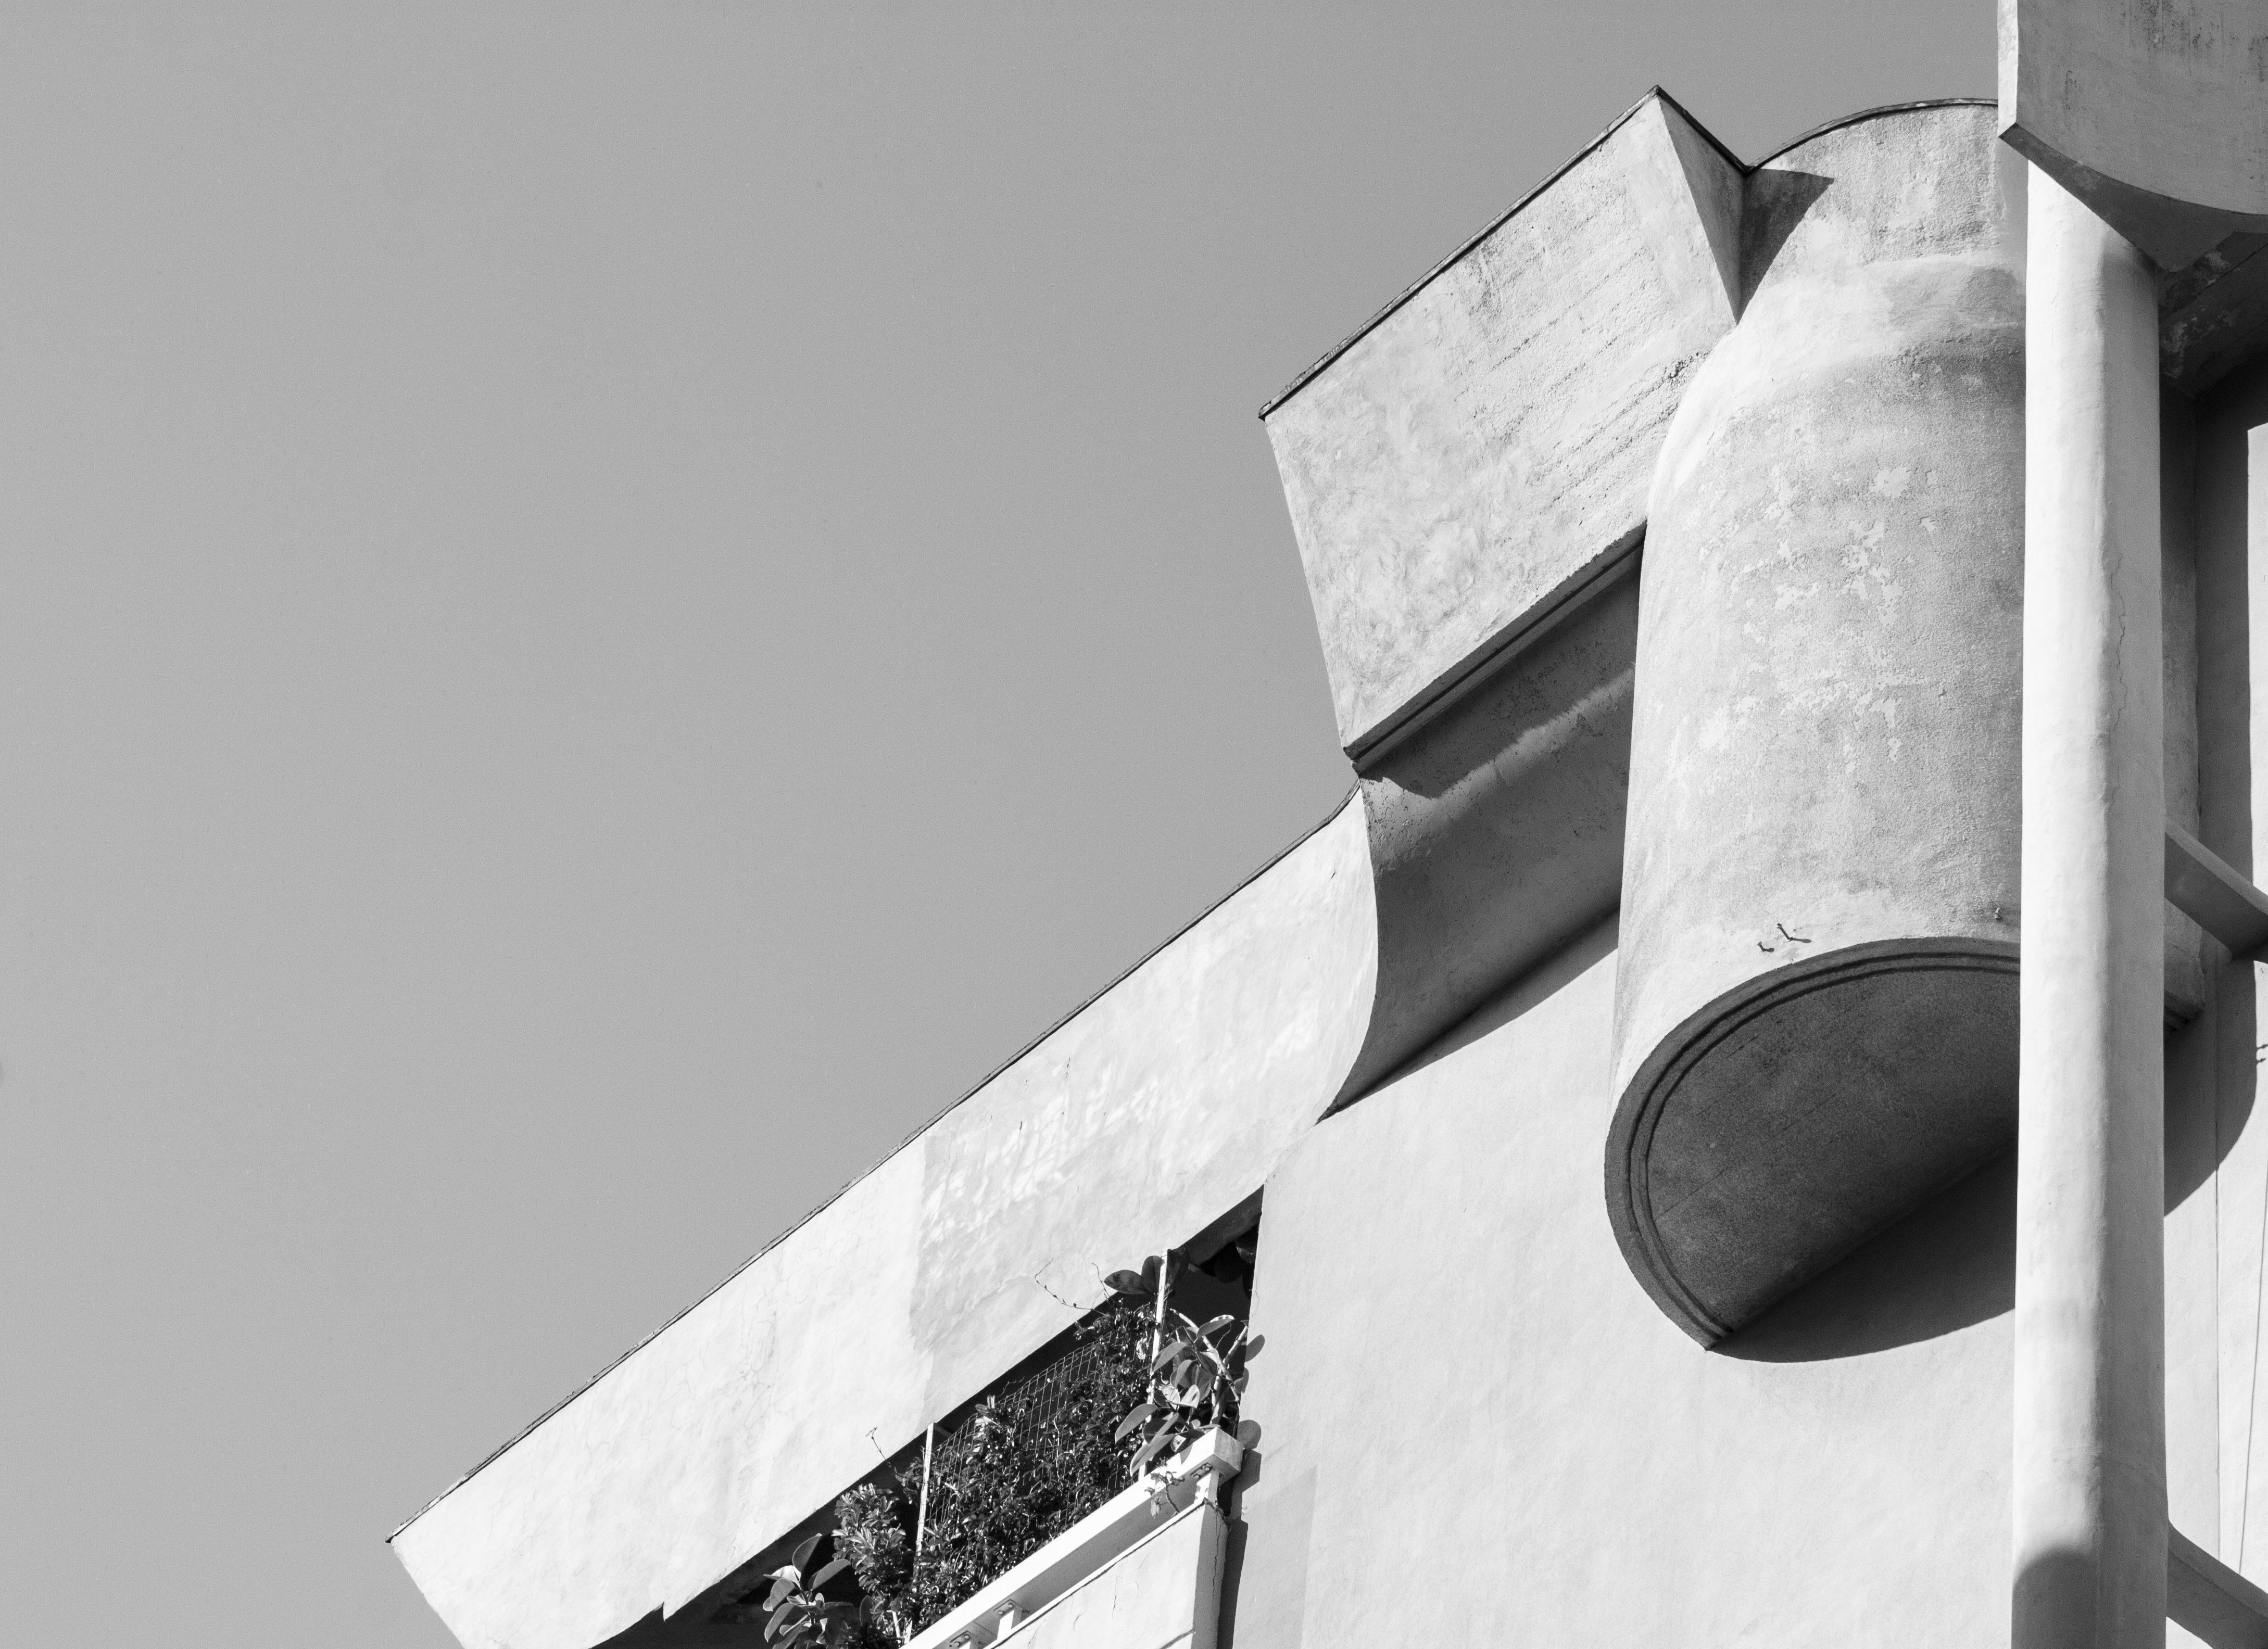 Edificio in Via S. Giacomo dei Capri, Napoli